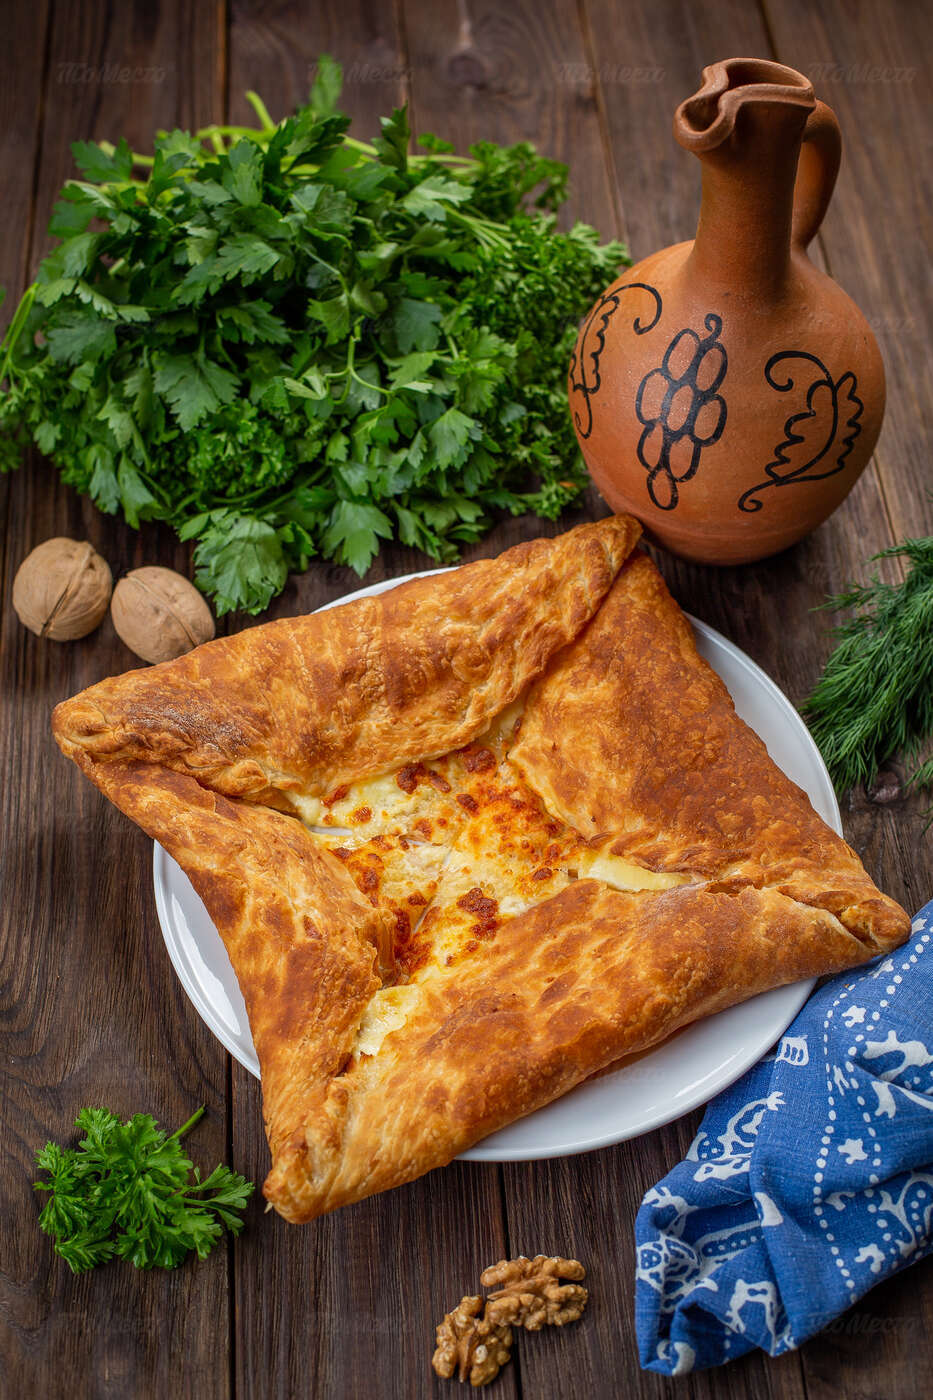 Меню кафе Хинкали & Хачапури на Льва Толстого фото 8